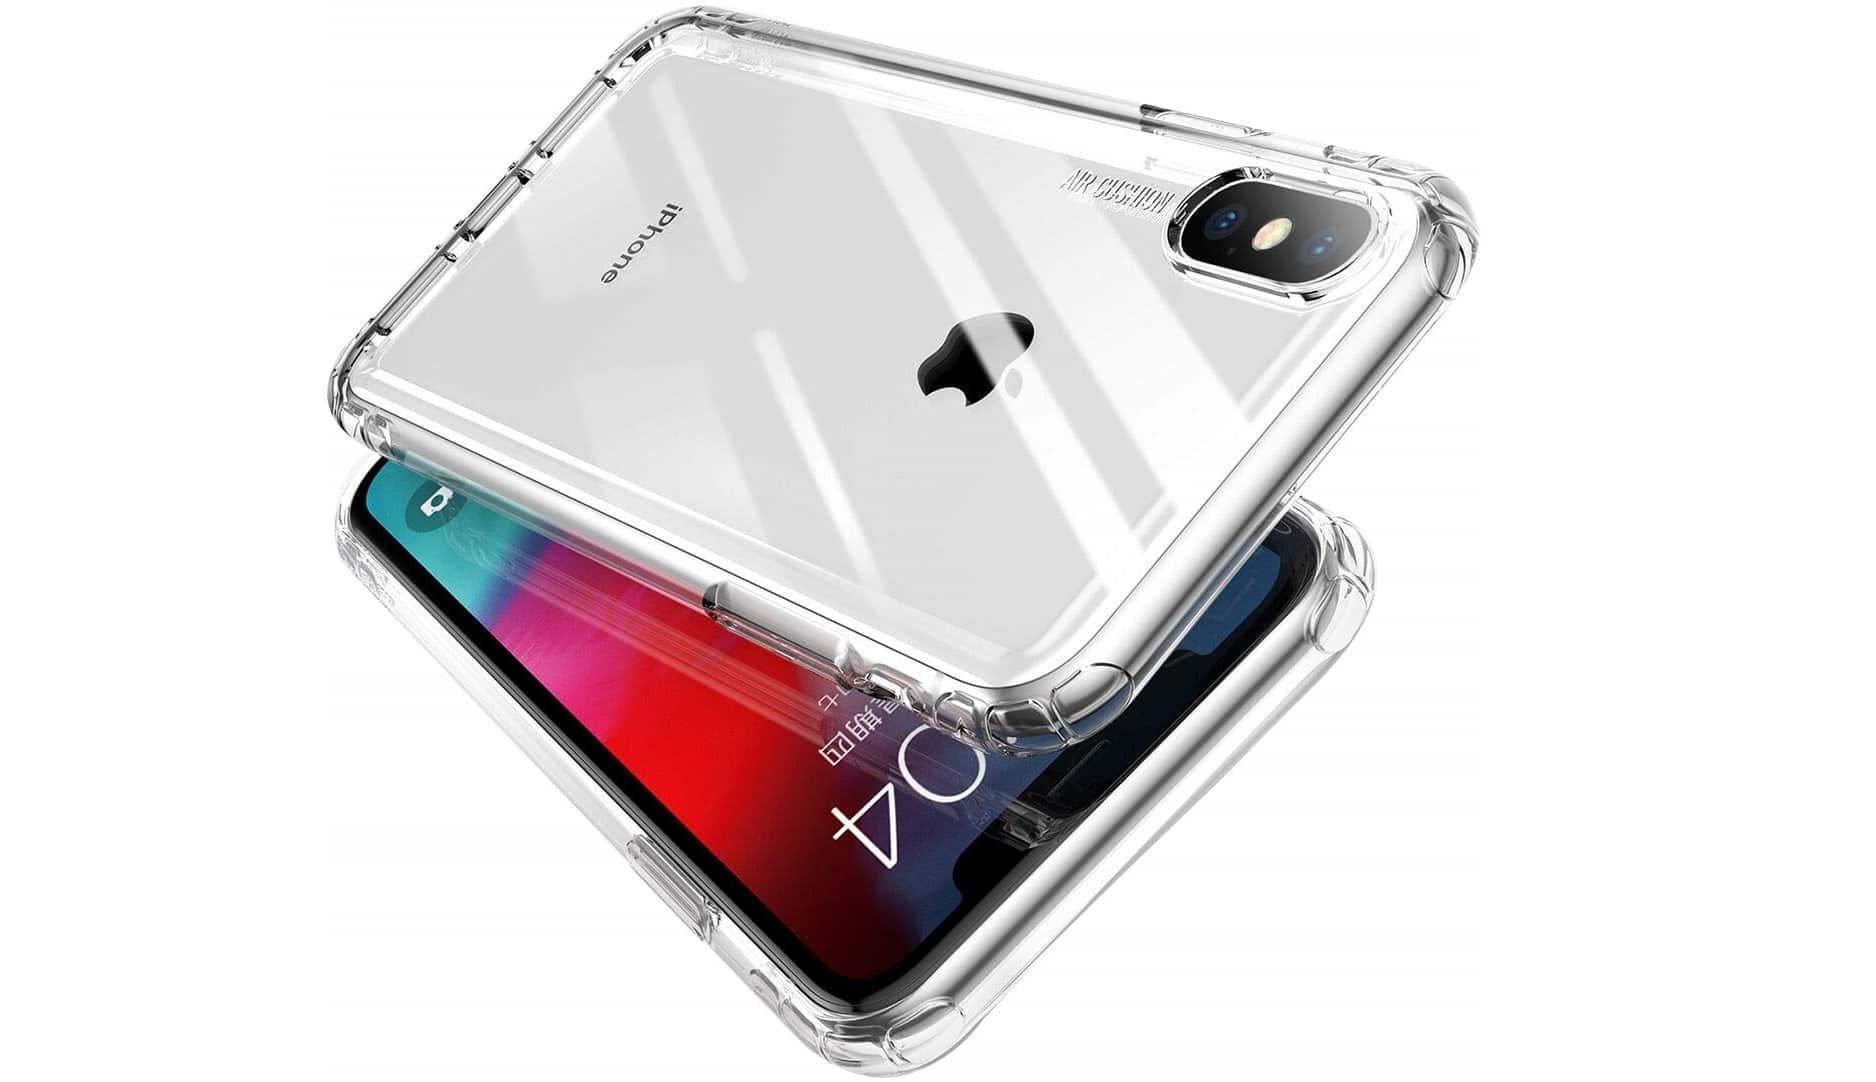 MKOAWA iPhone XS Max Clear Case